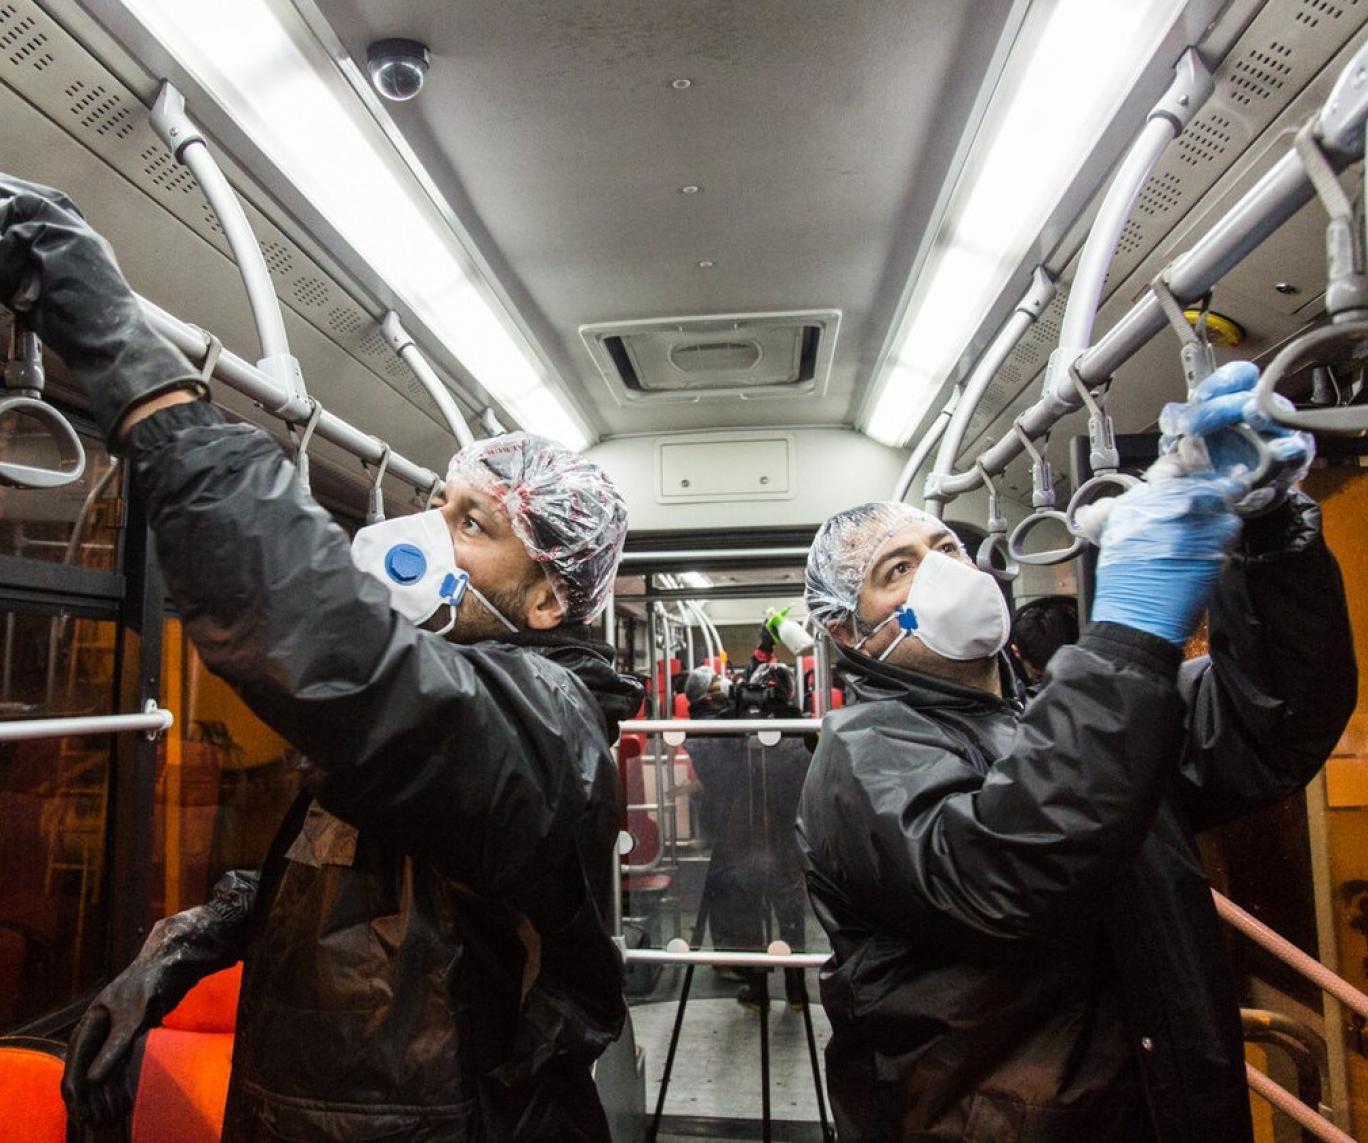 Coronavirus: Acht Tote, Bildungszentren geschlossen, Kulturprogramme eingestellt